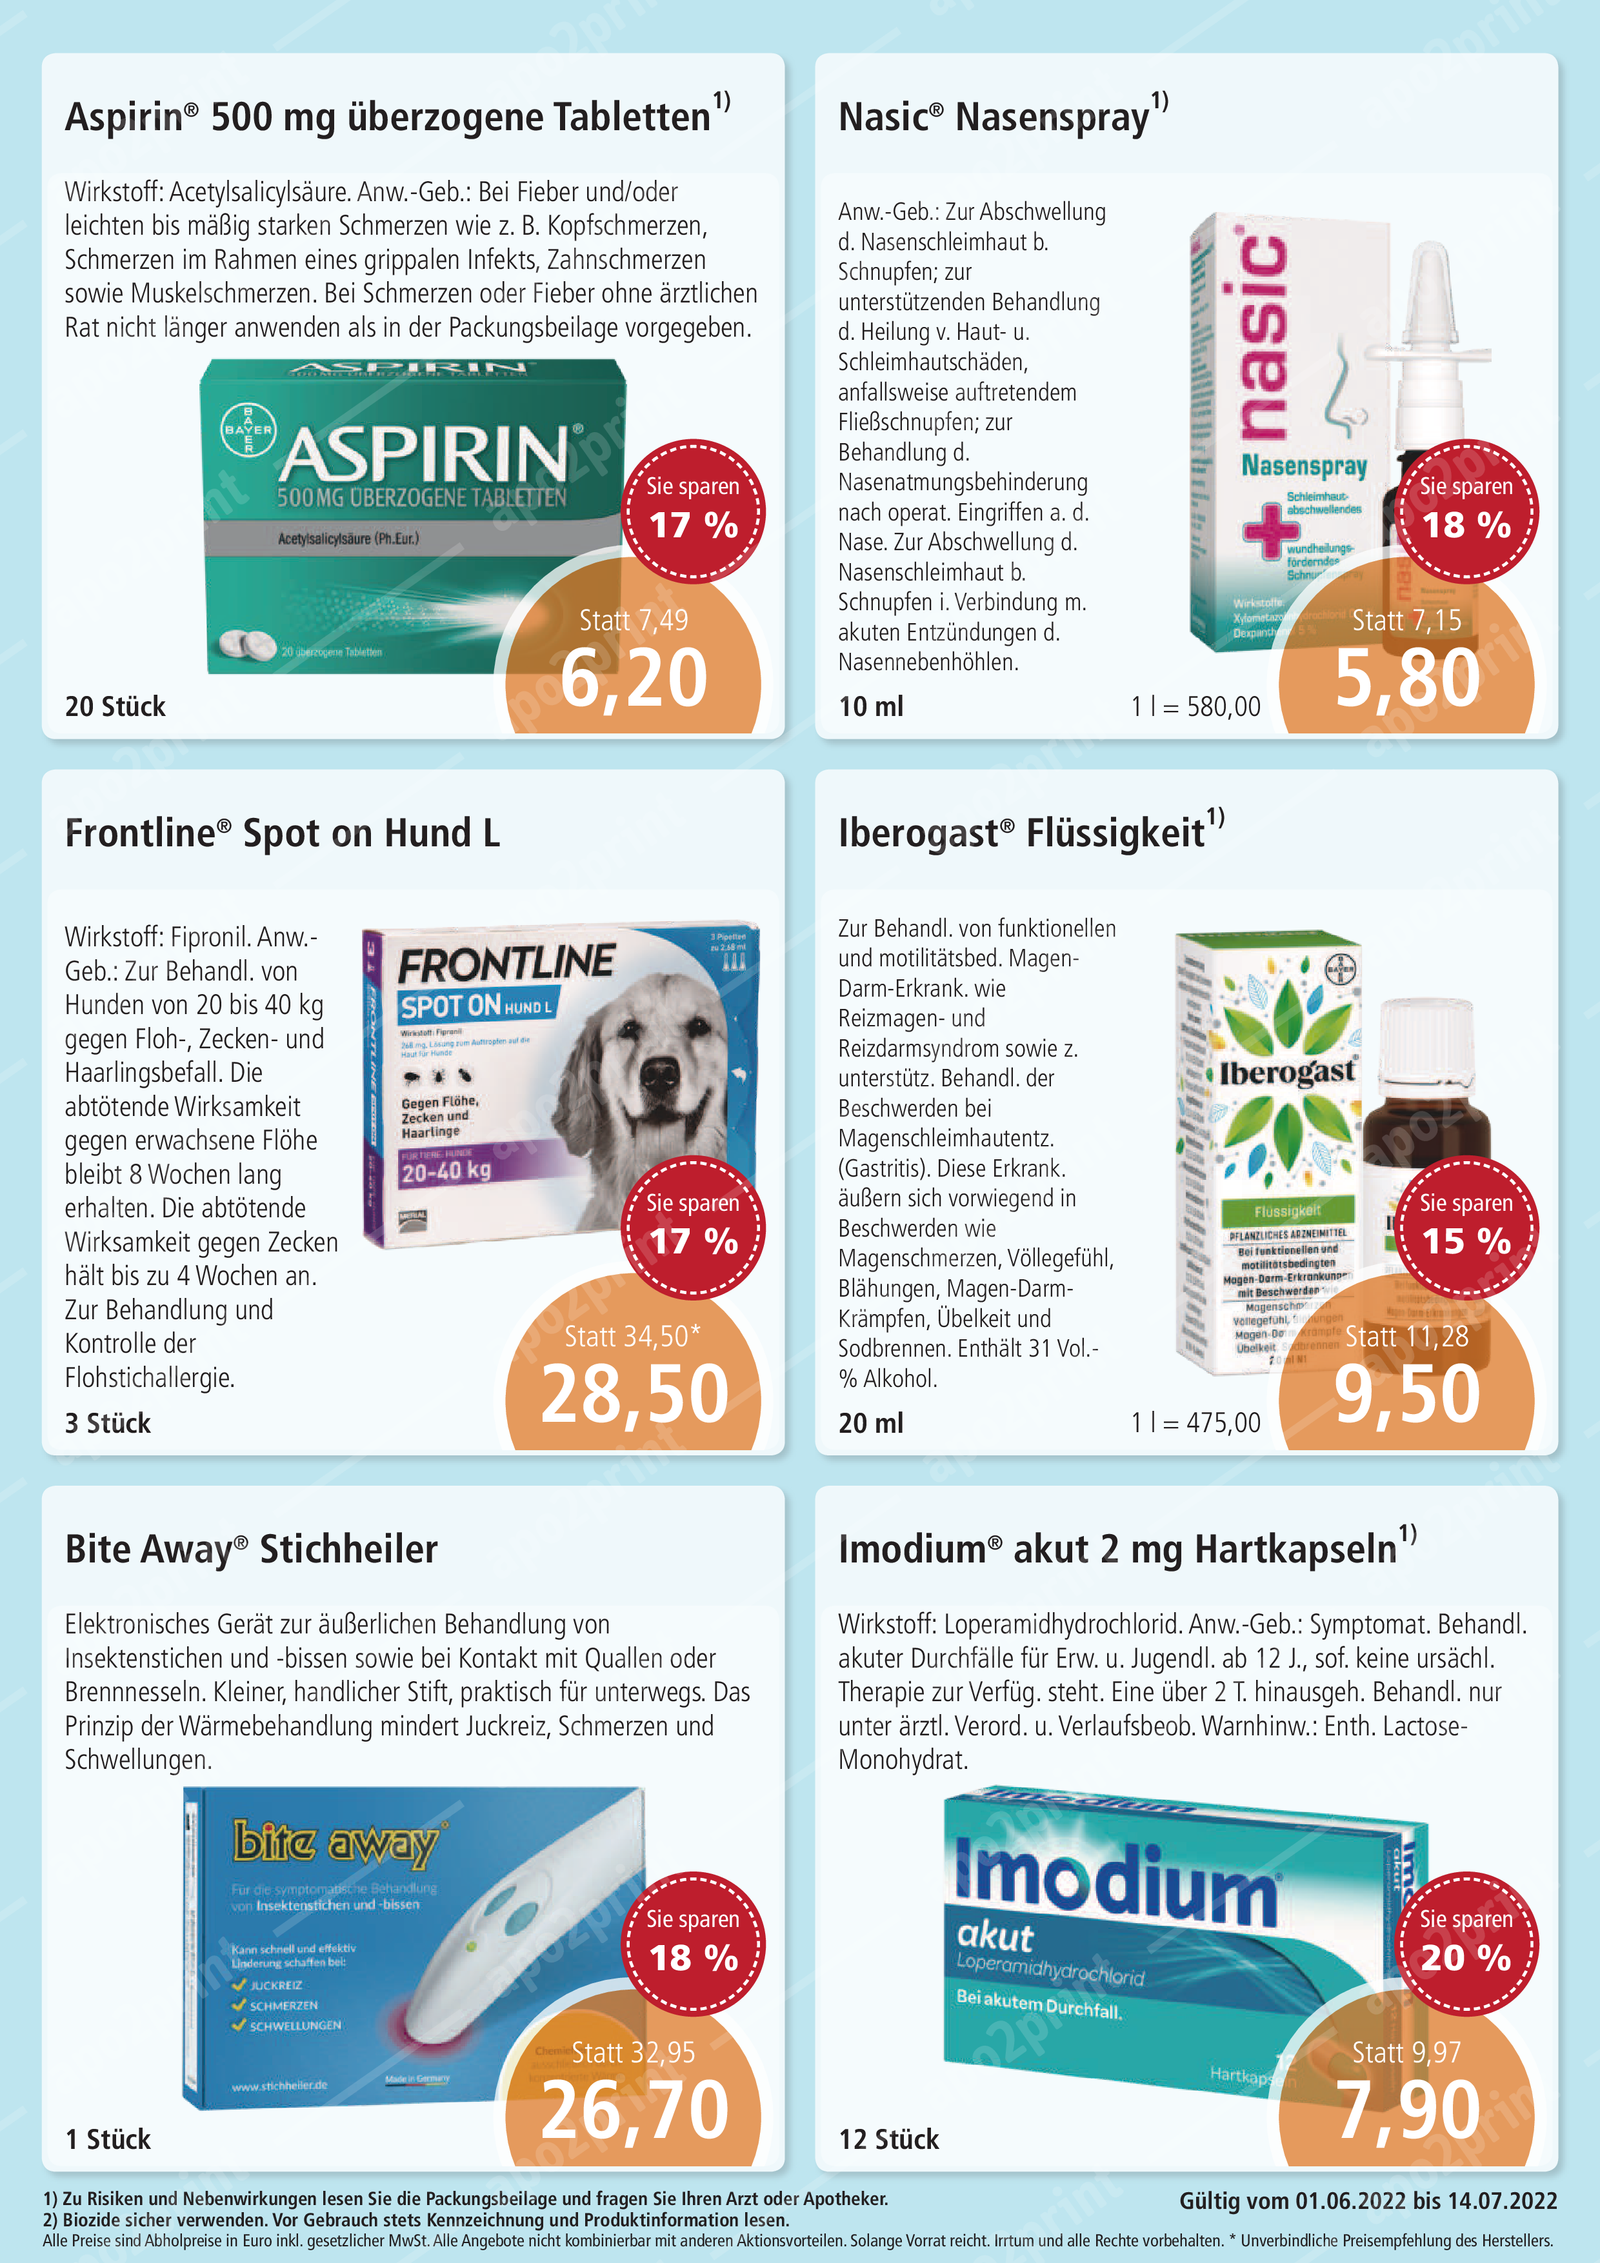 https://mein-uploads.apocdn.net/21702/leaflets/21702_flyer-Seite3.png